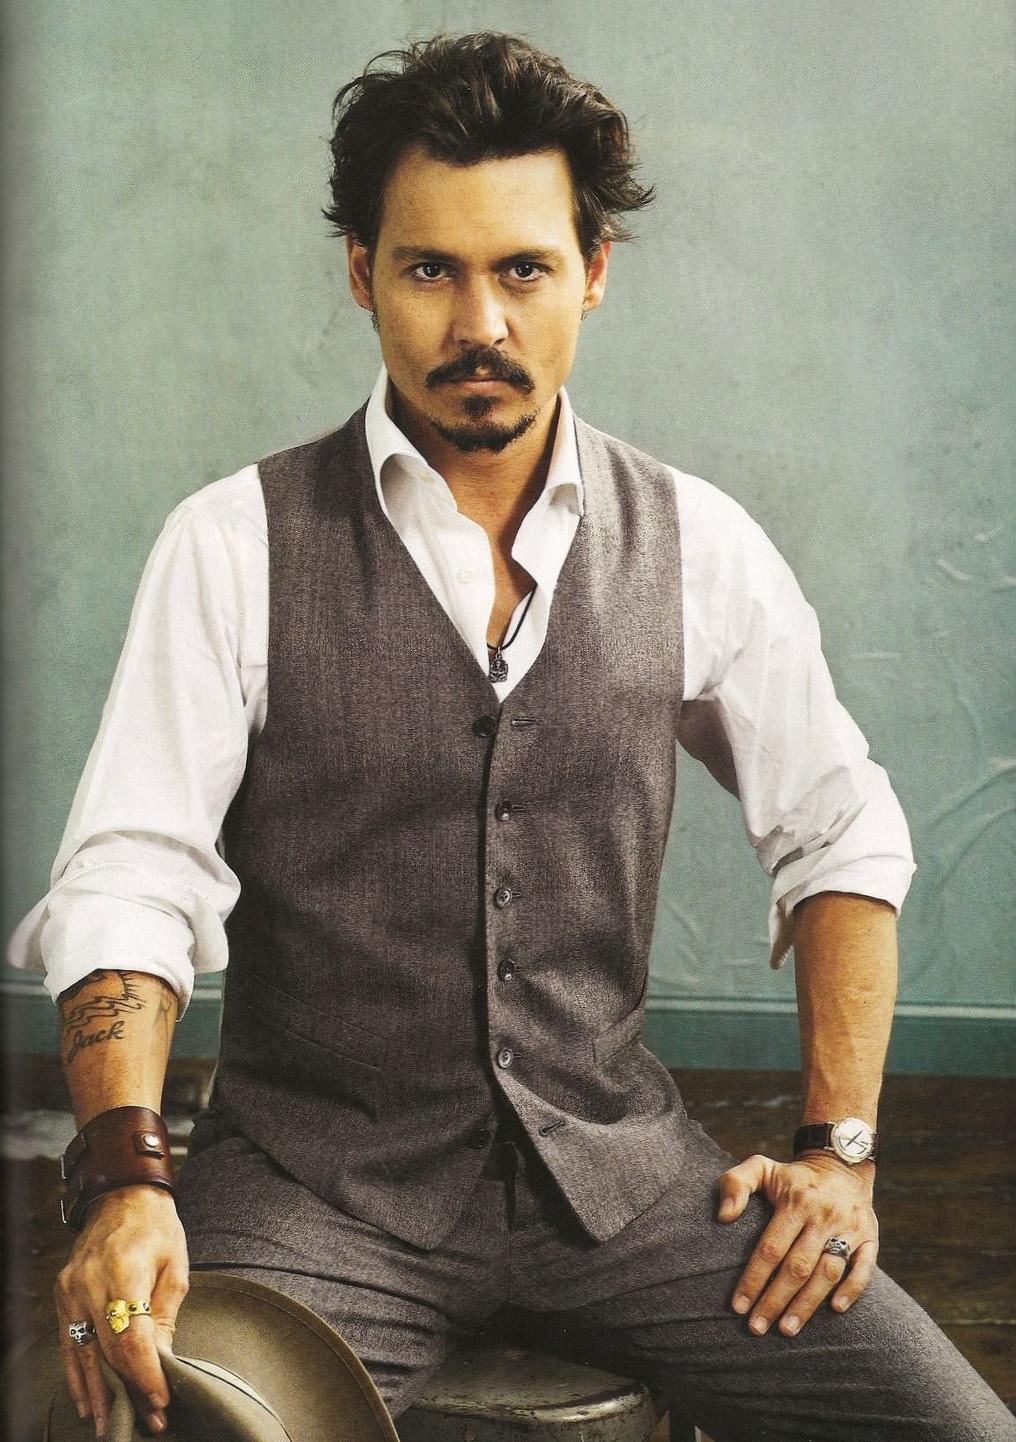 Johnny Depp - Johnny Depp Photo (32658801) - Fanpop Johnny Depp/newspaper Articles